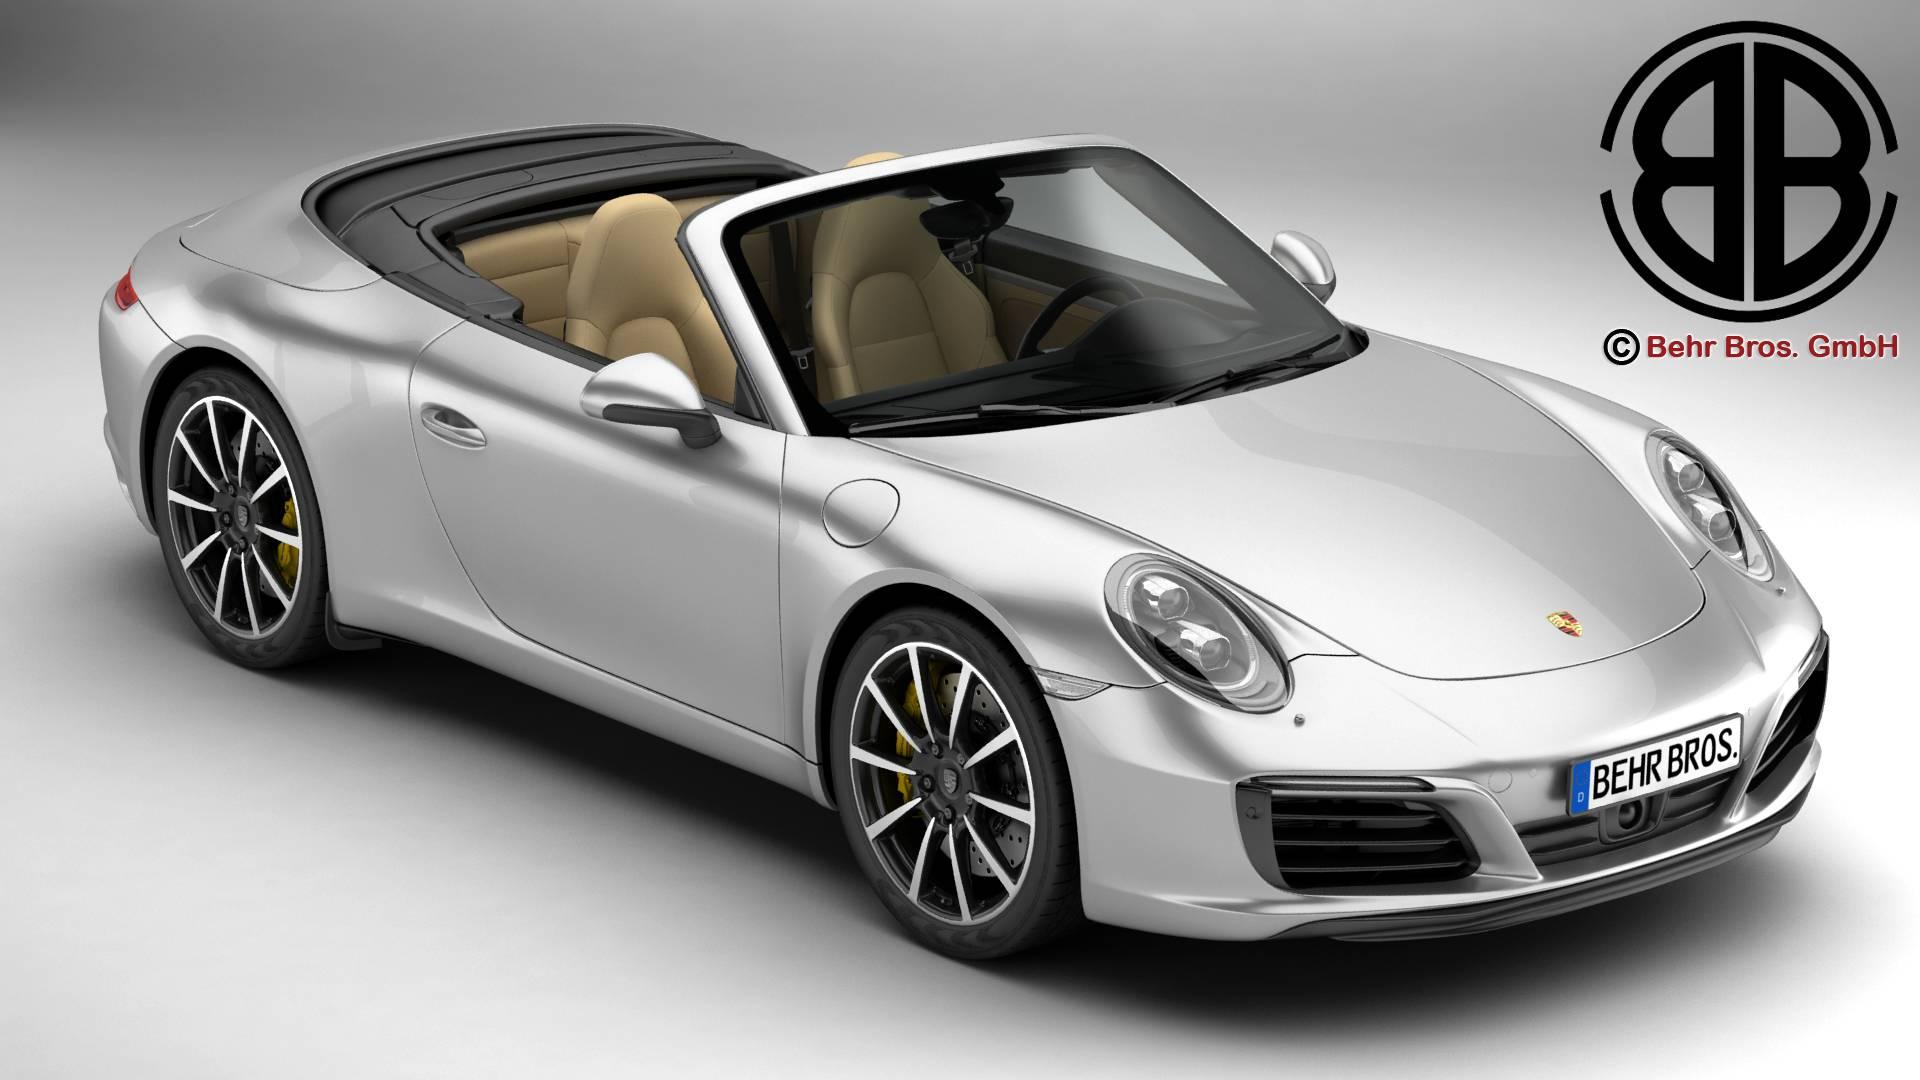 porsche 911 carrera cabriolet 2017 3d model buy porsche. Black Bedroom Furniture Sets. Home Design Ideas